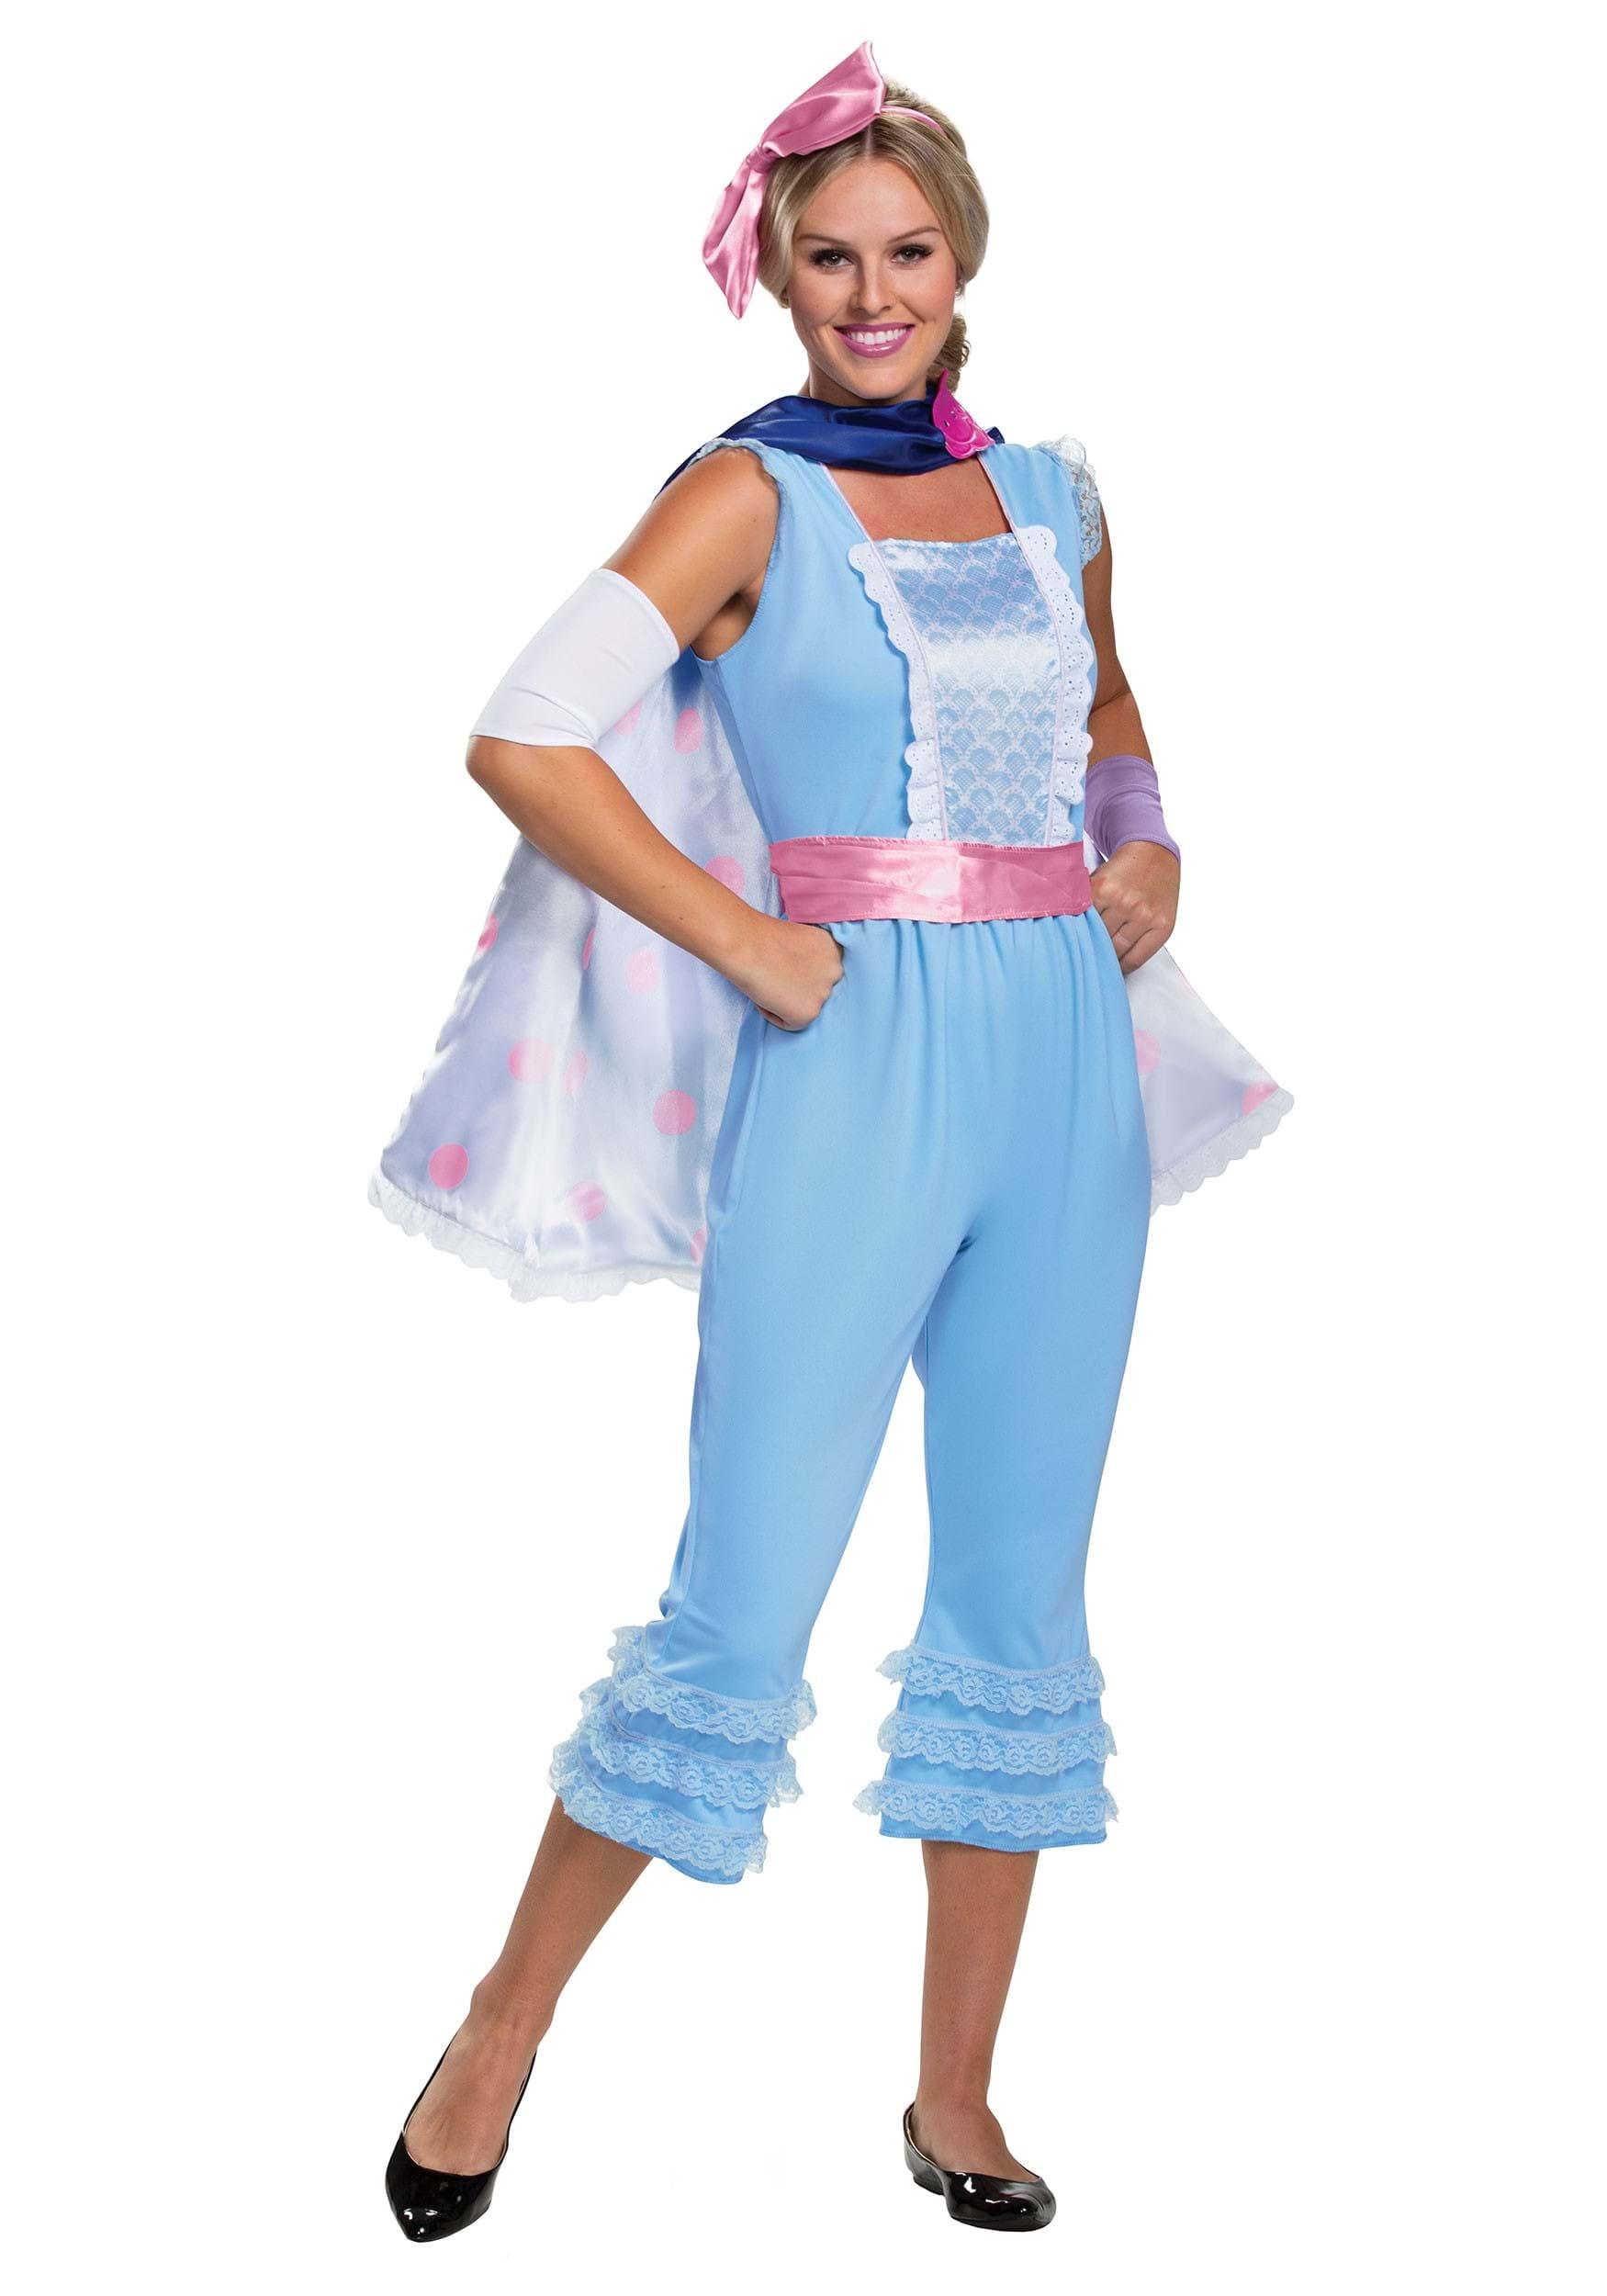 Toy Story 4 Halloween Costumes.Toy Story Women S Bo Peep Deluxe Costume